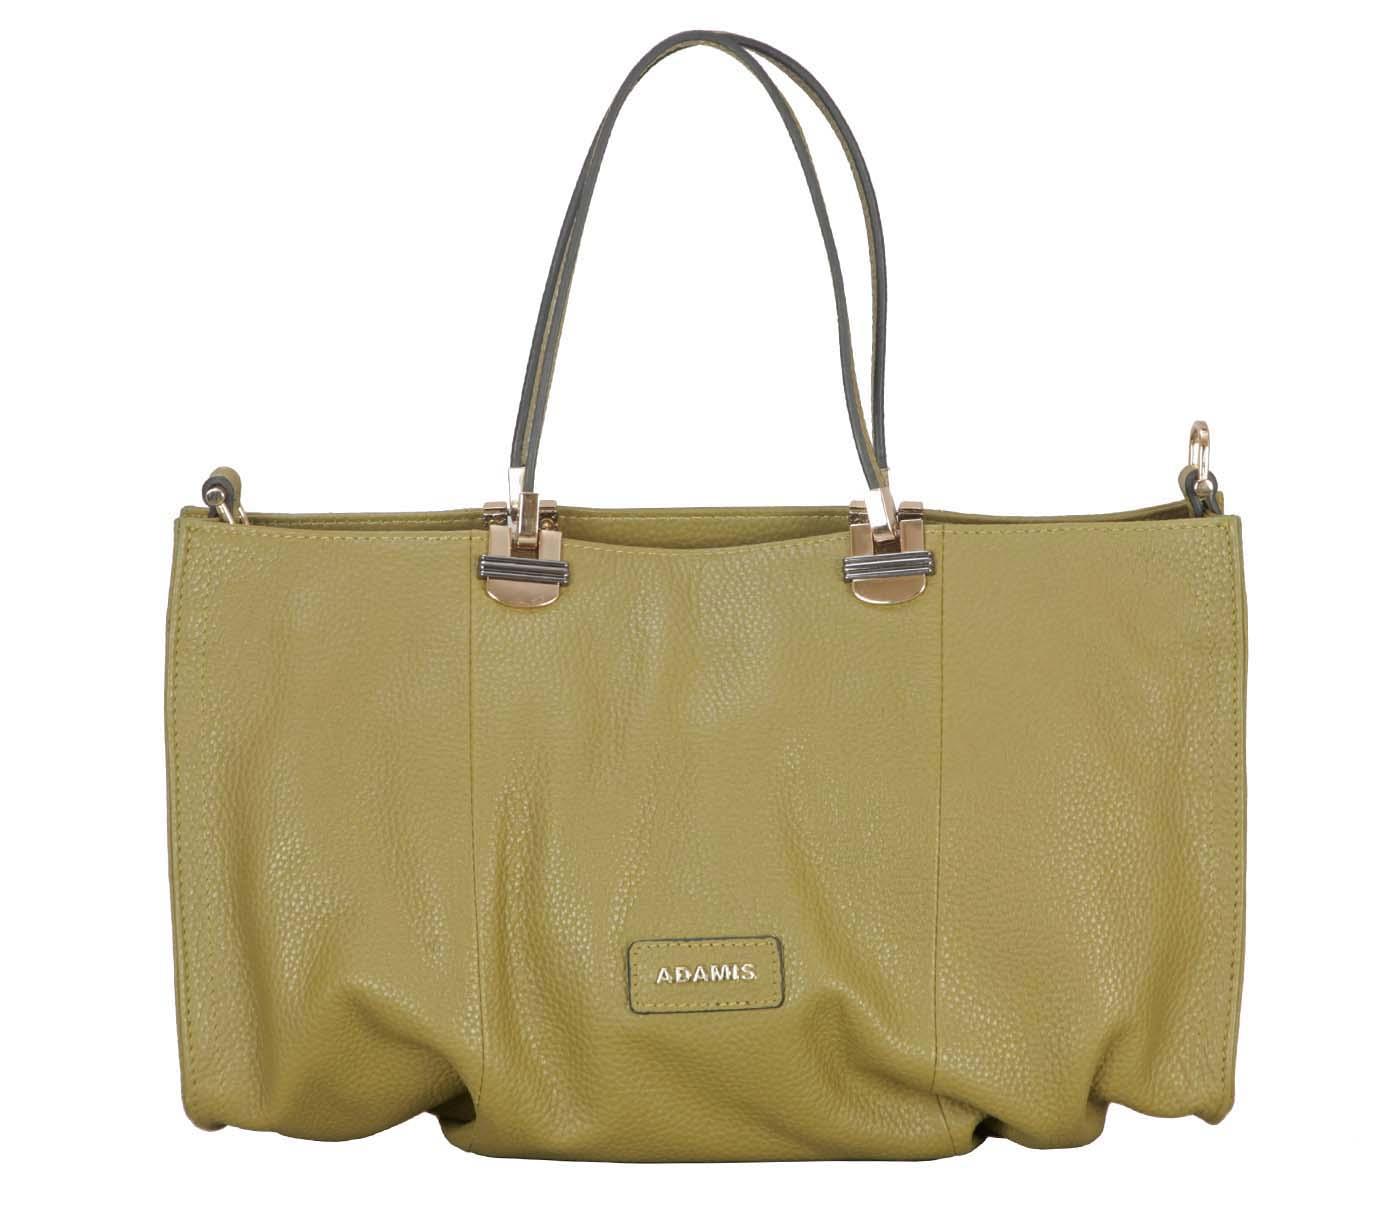 Handbag - B851